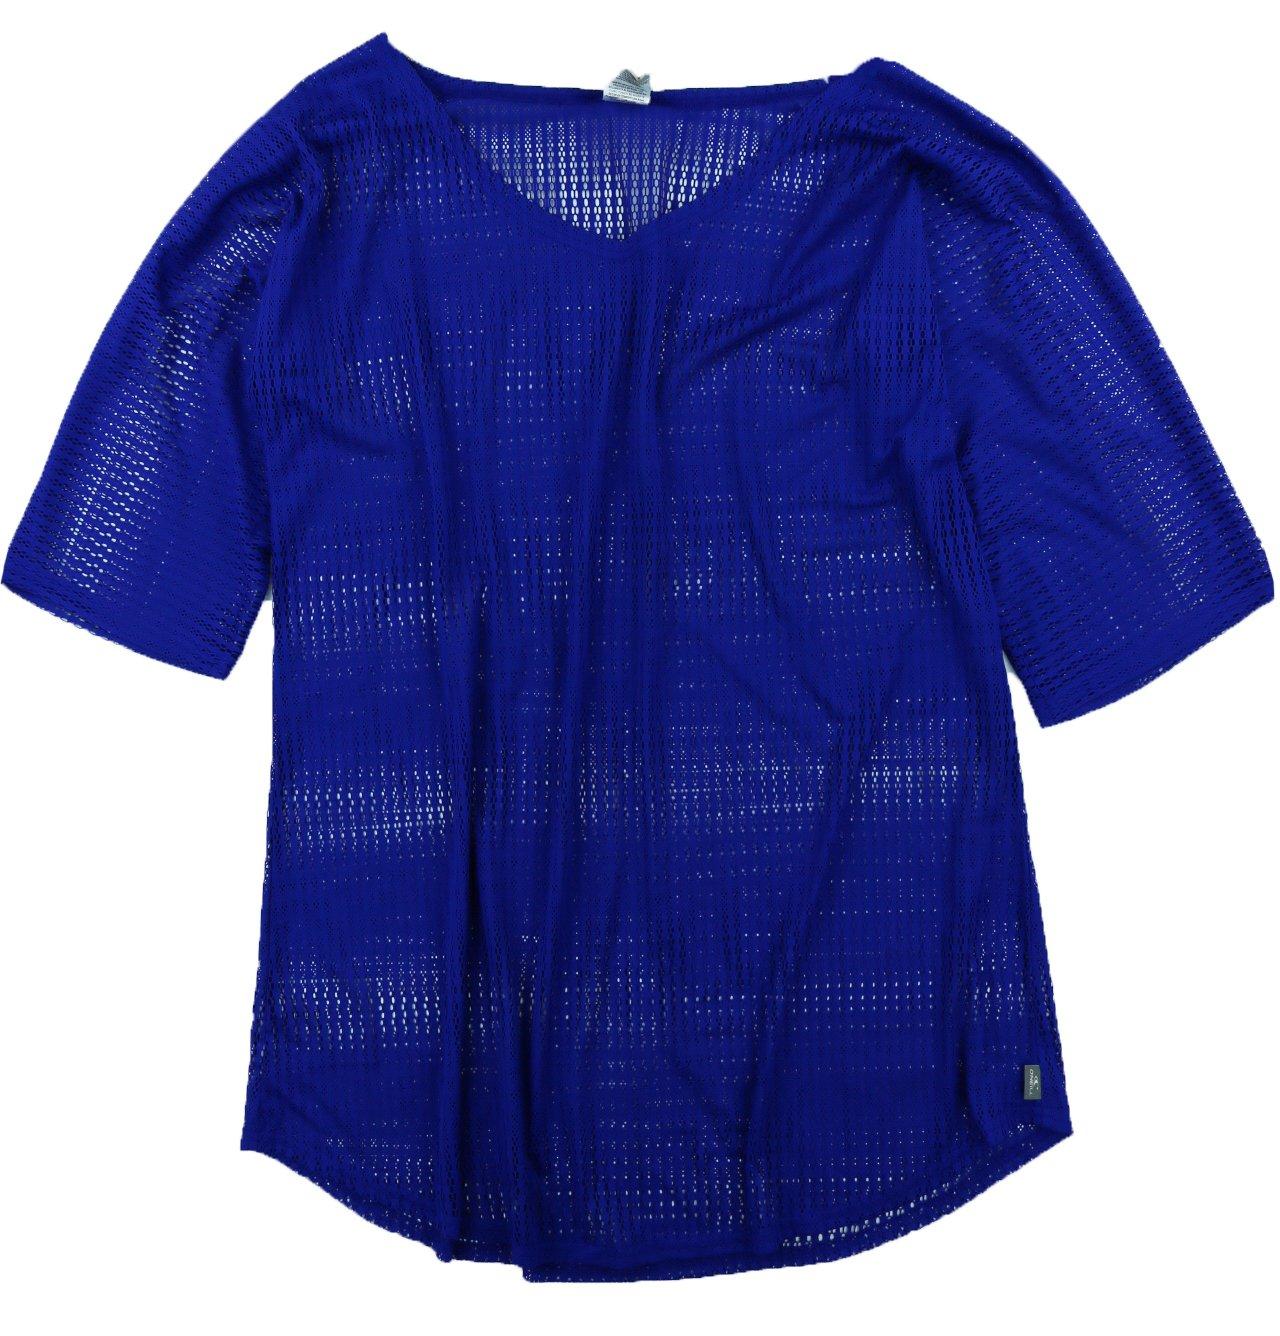 ONeill Womens Swimsuit Cover up (M/L, Cobalt Blue)